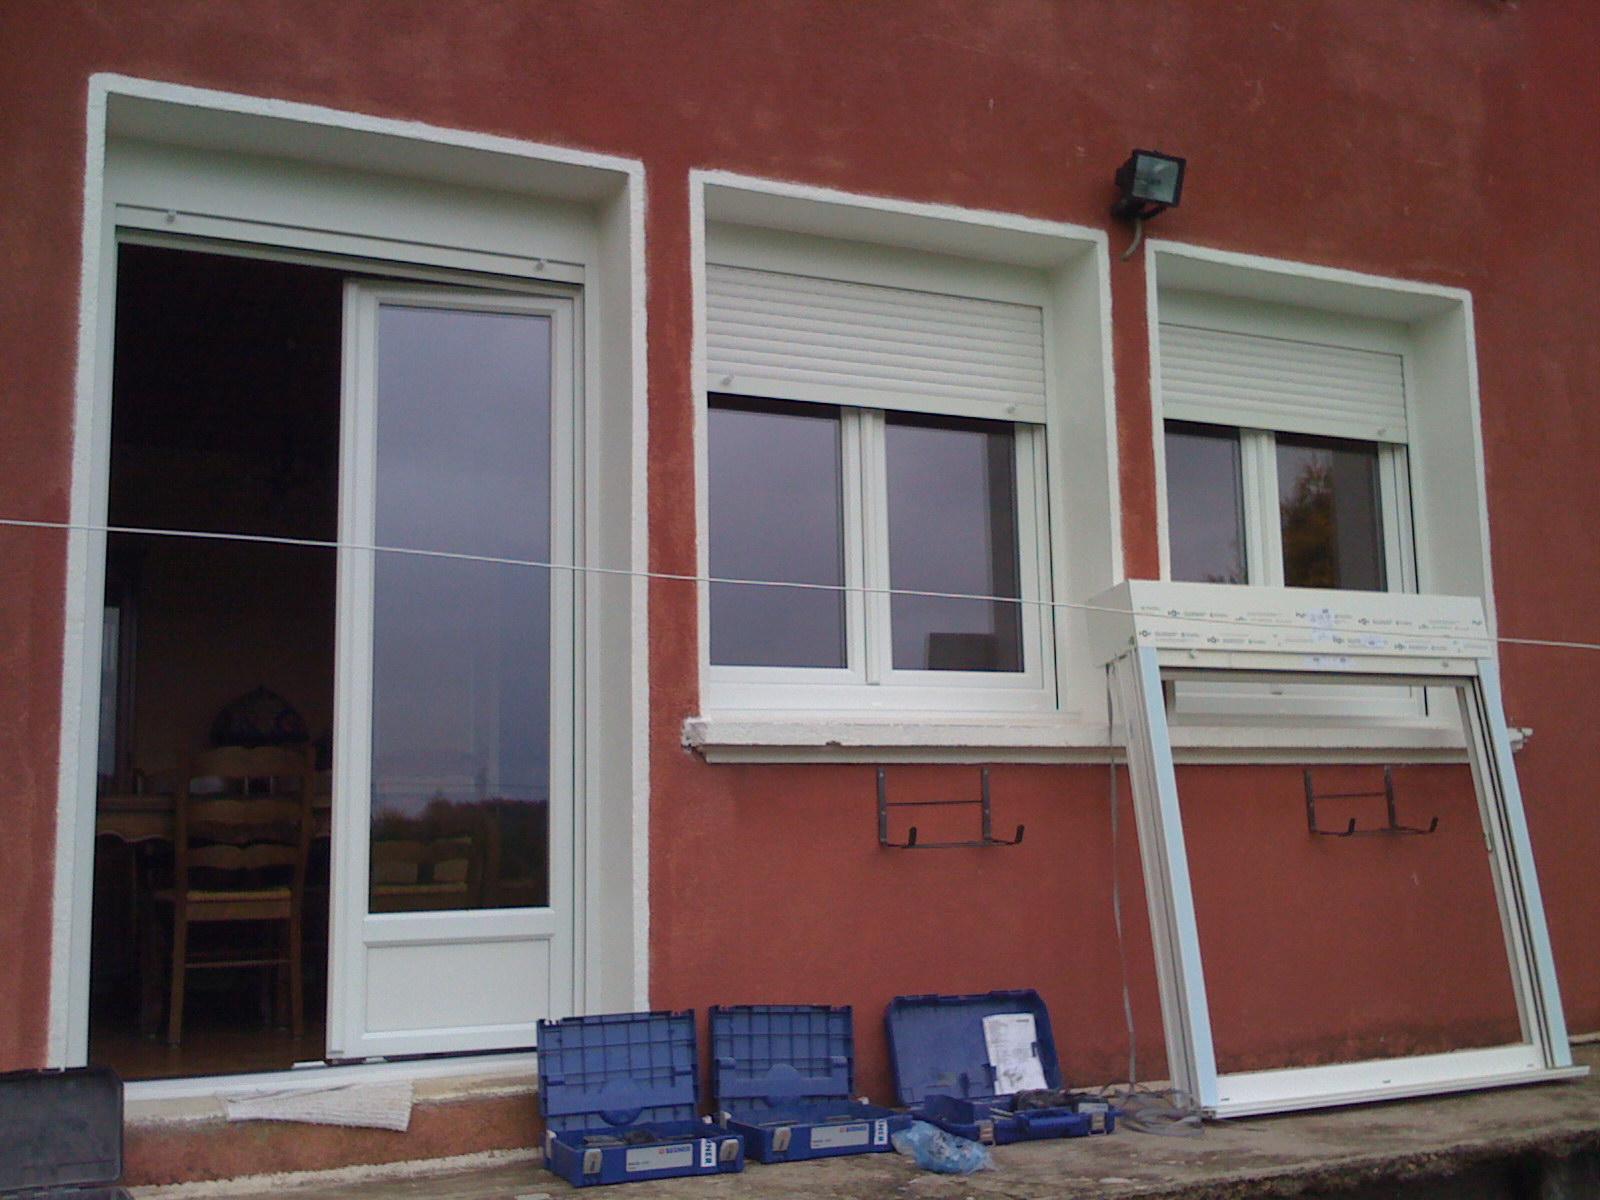 cg menuiserie sarl fen tres pvc bois alu porte d 39 entr e porte int rieure porte de garage. Black Bedroom Furniture Sets. Home Design Ideas